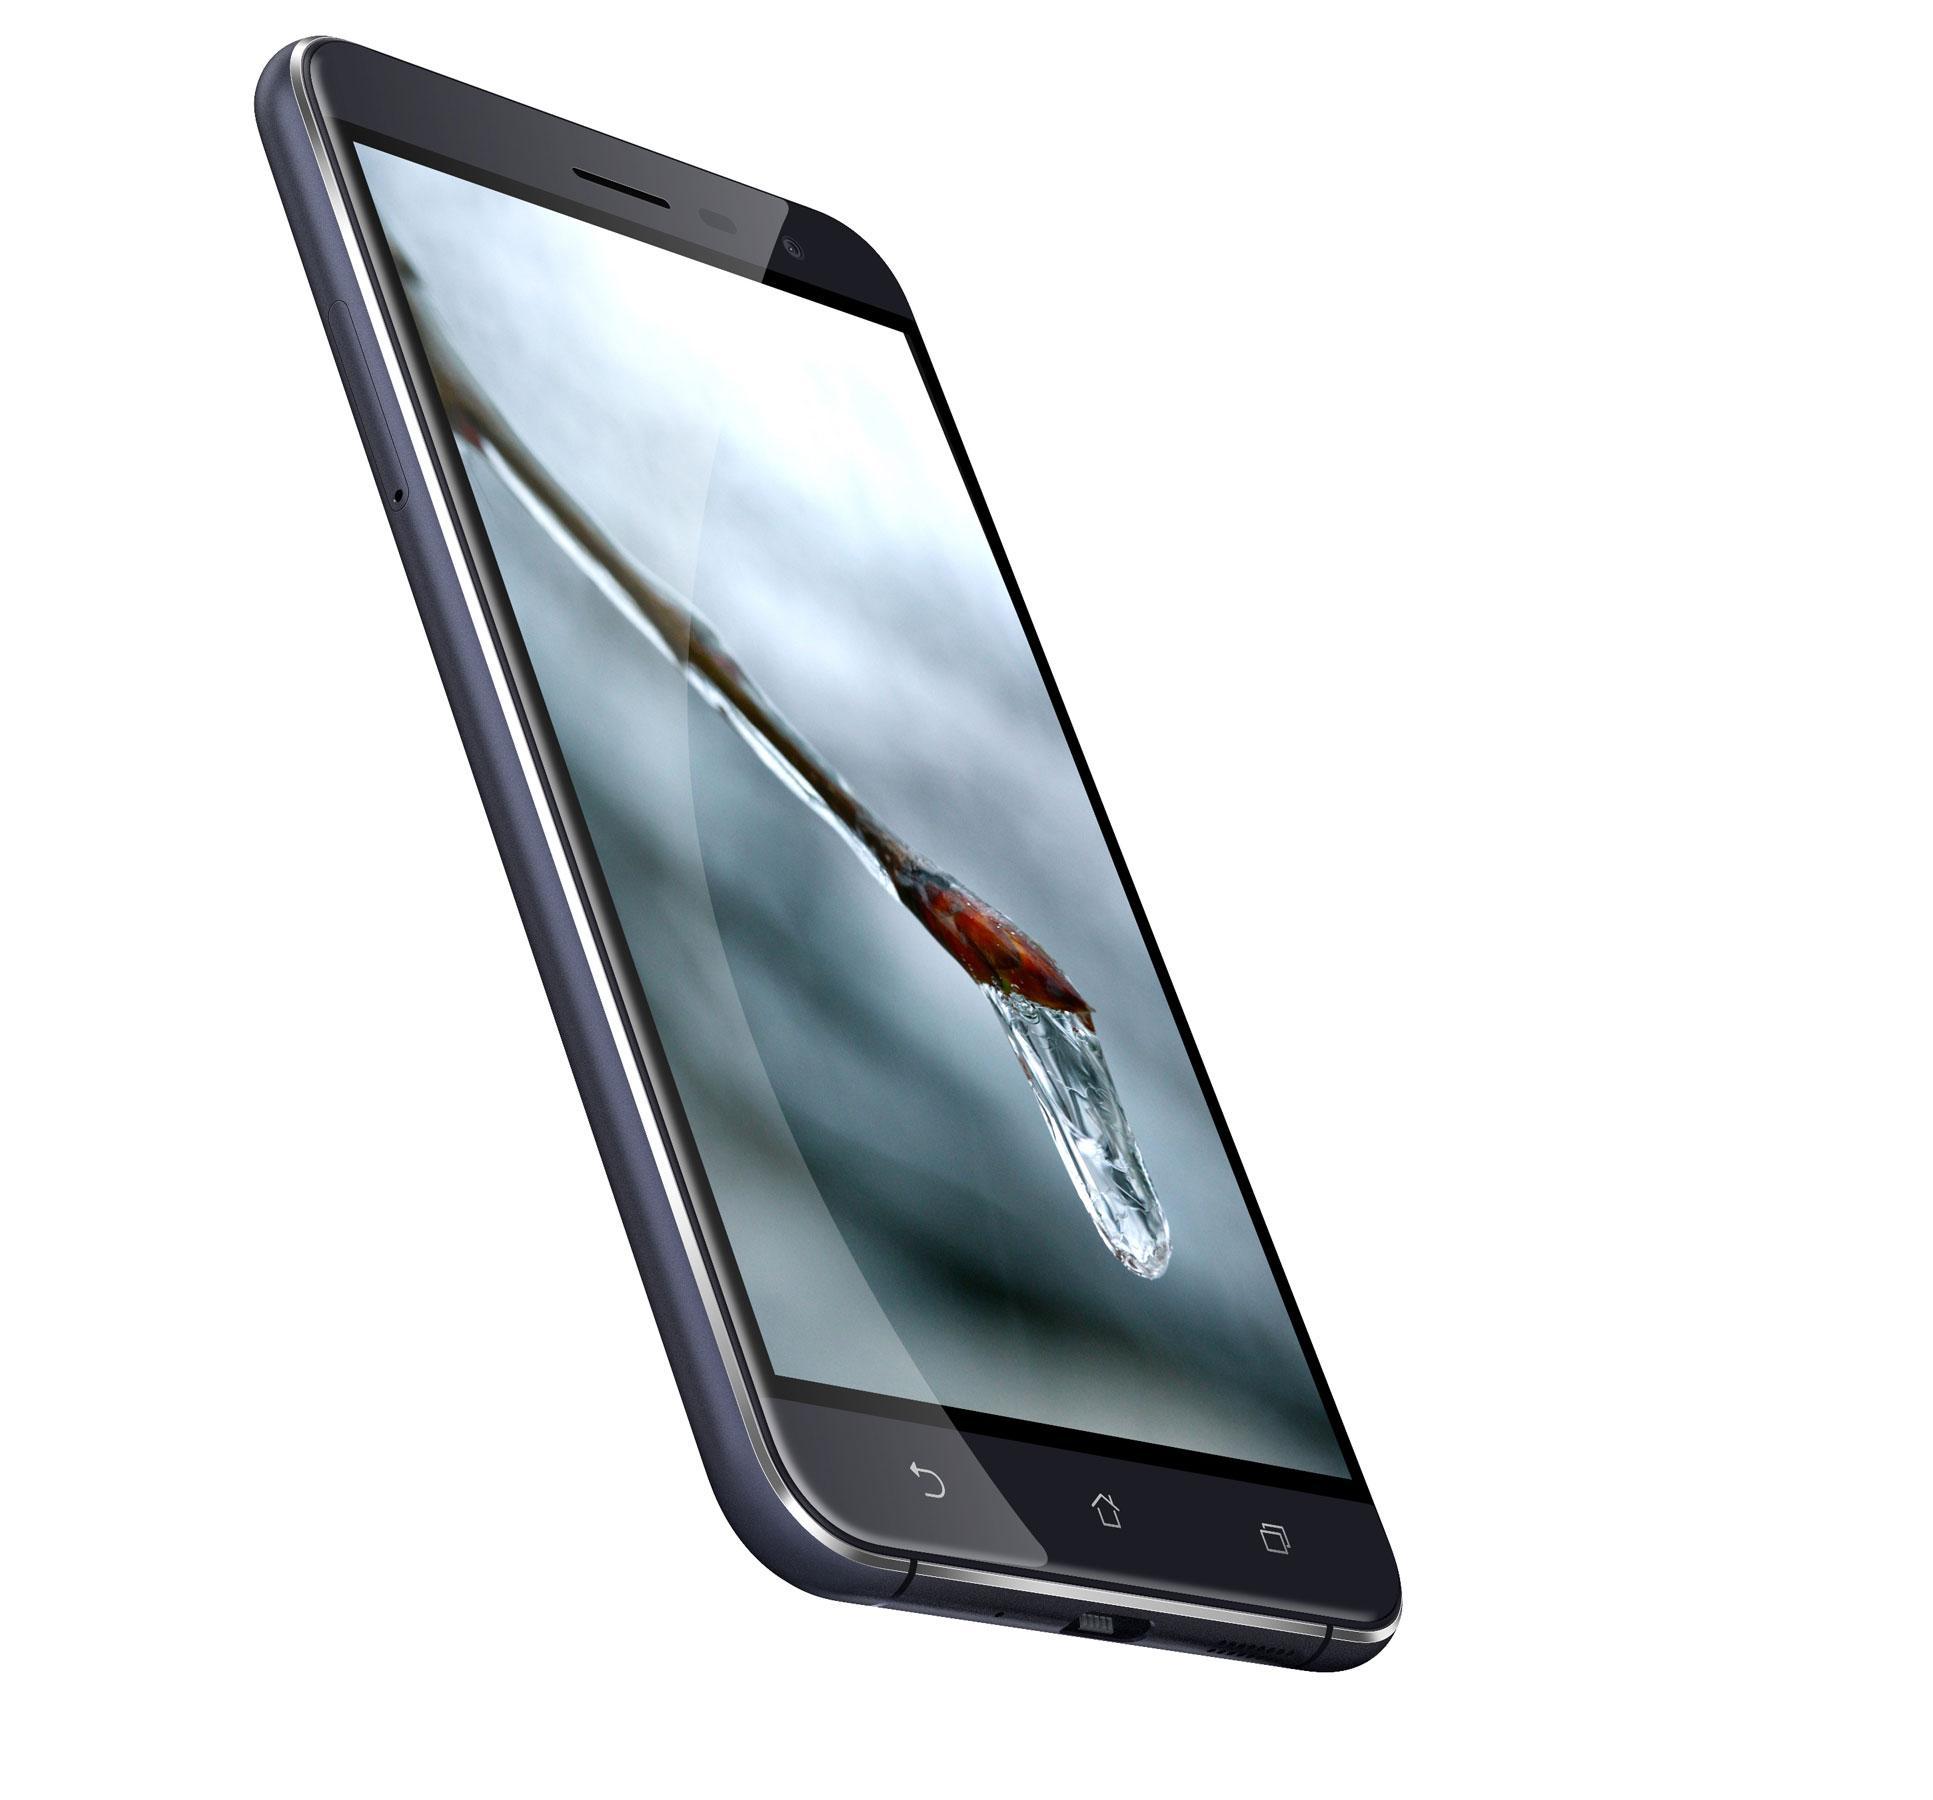 Asus Zenfone 3 Android